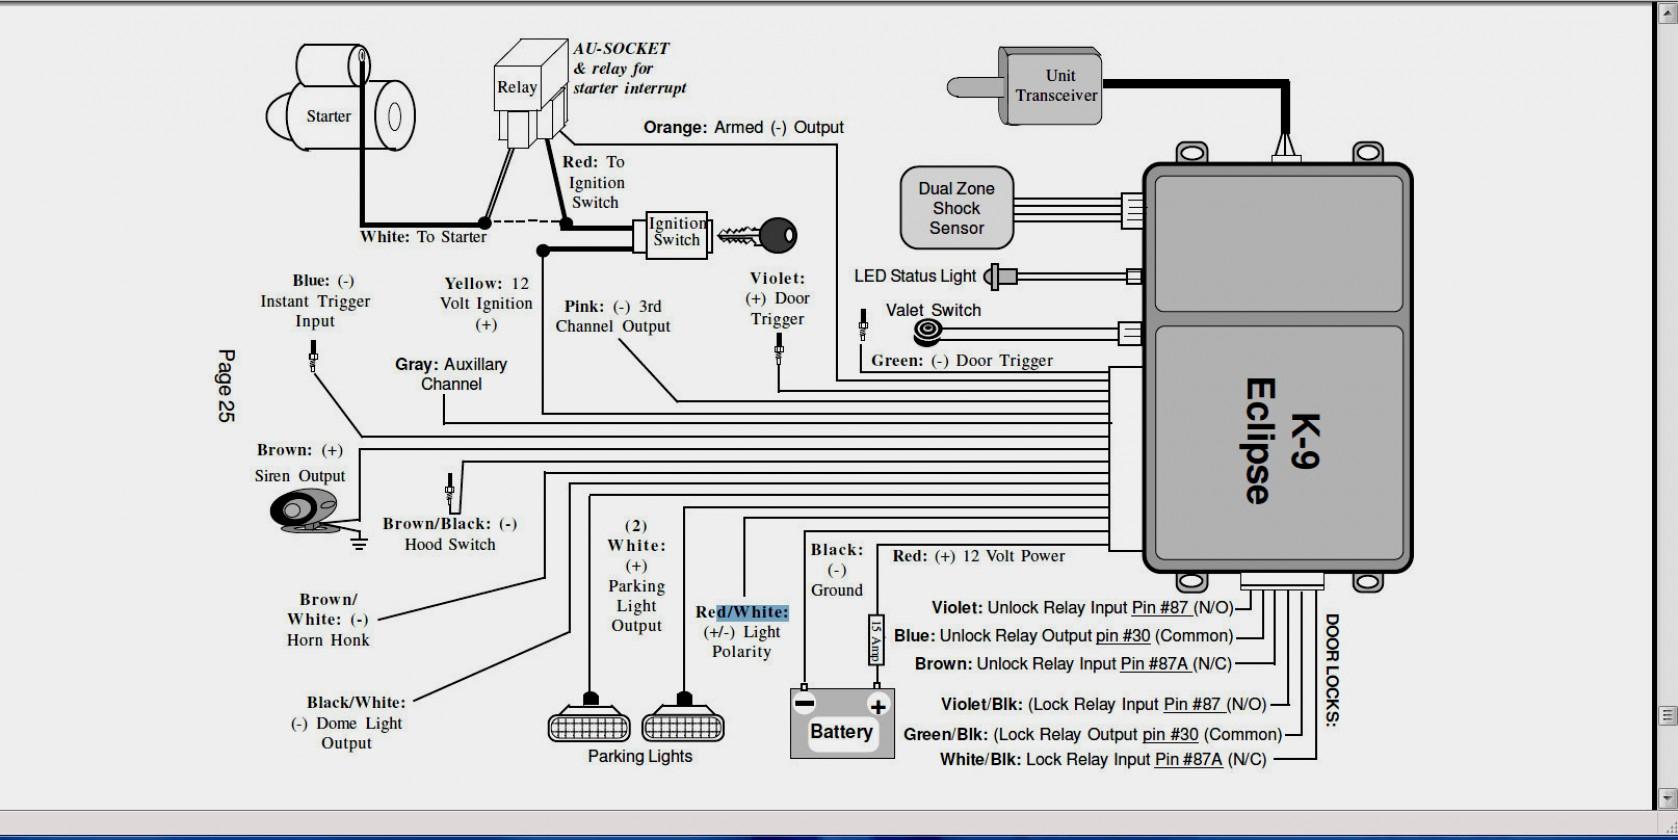 Compustar Wiring Diagram - Wiring Diagrams - Viper Remote Start Wiring Diagram